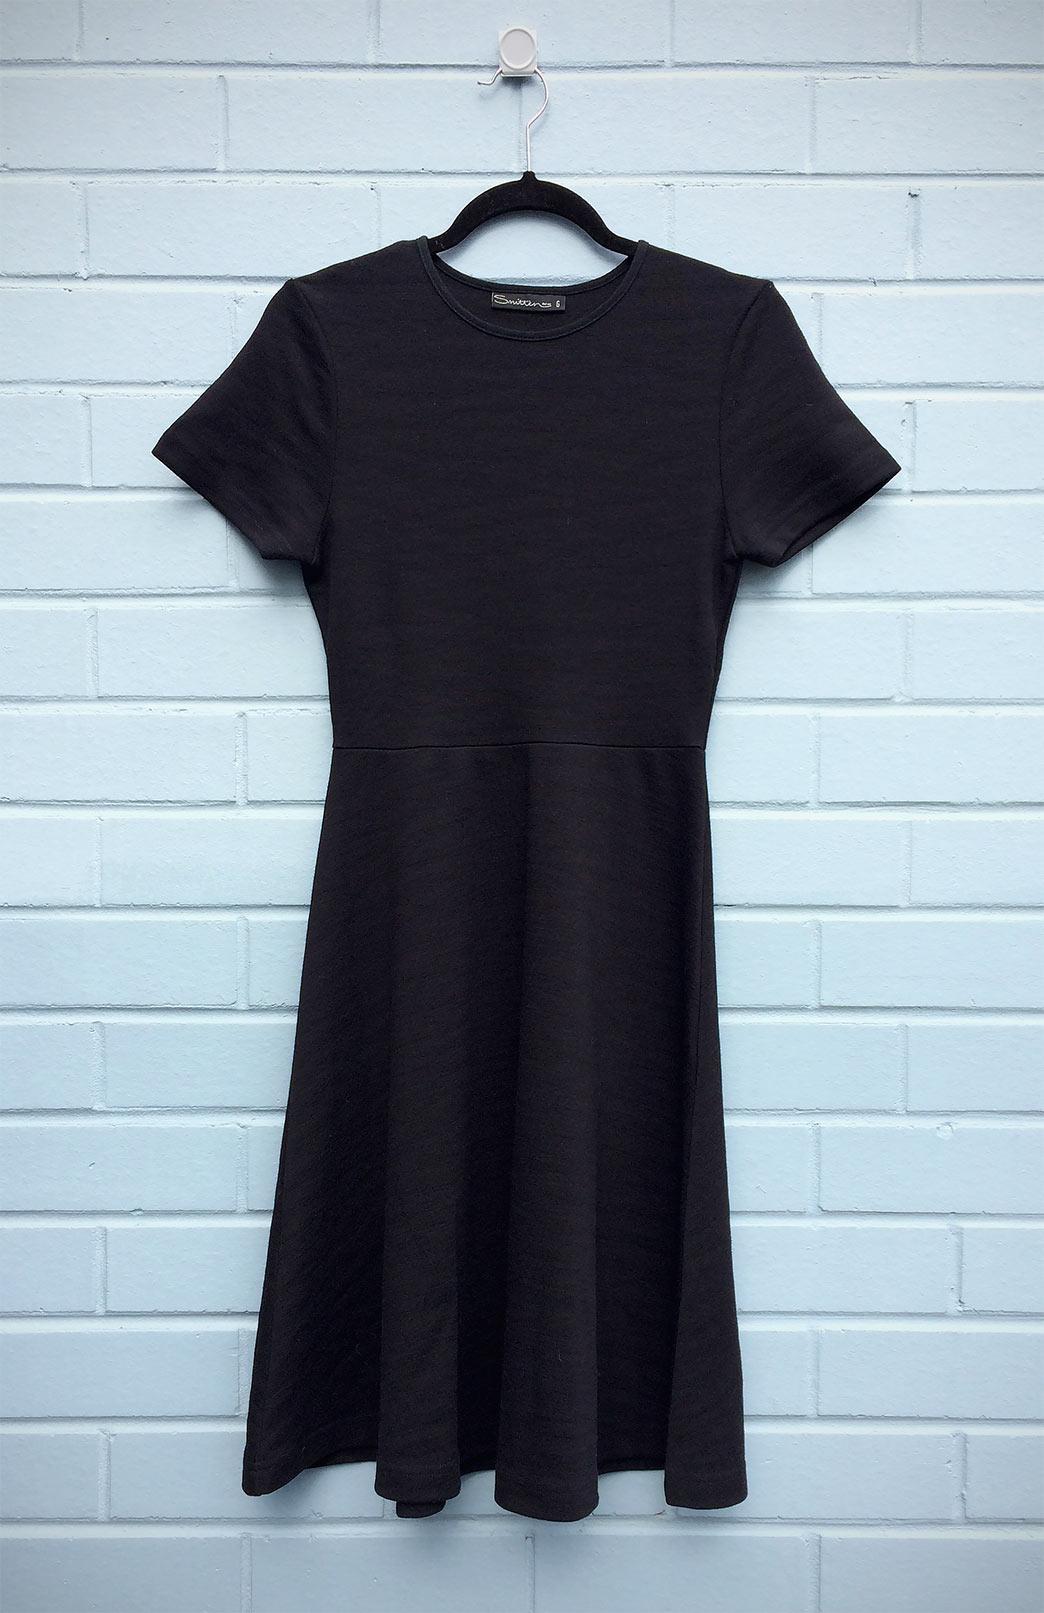 Zoe Dress (Seconds) - Women's Black Short Sleeved Merino Wool Dress with Waist Seam and A-Line Skirt - Smitten Merino Tasmania Australia